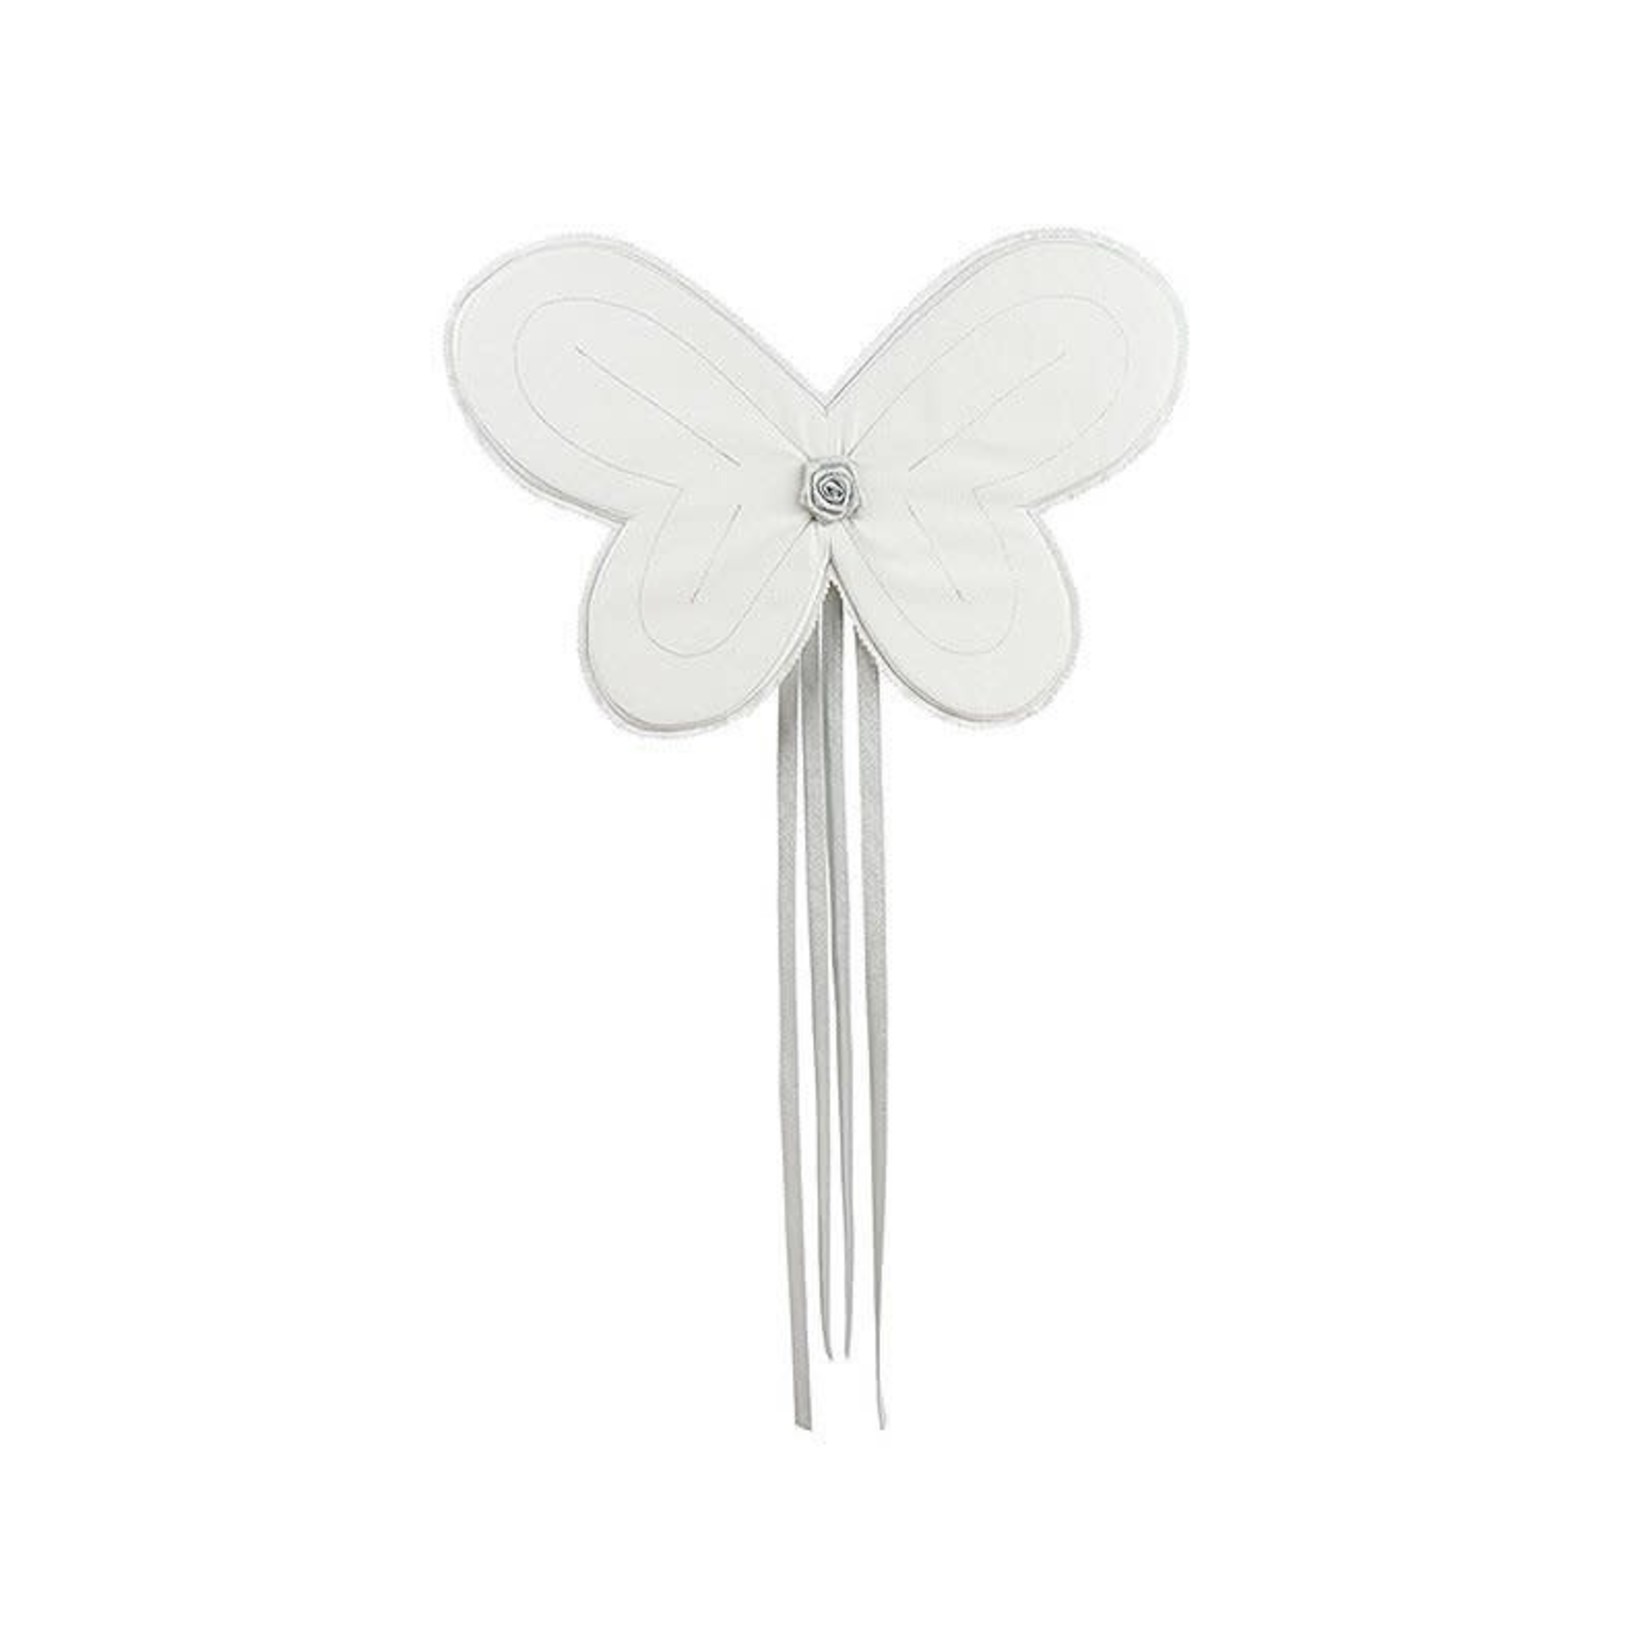 Sunnylife Wings - White